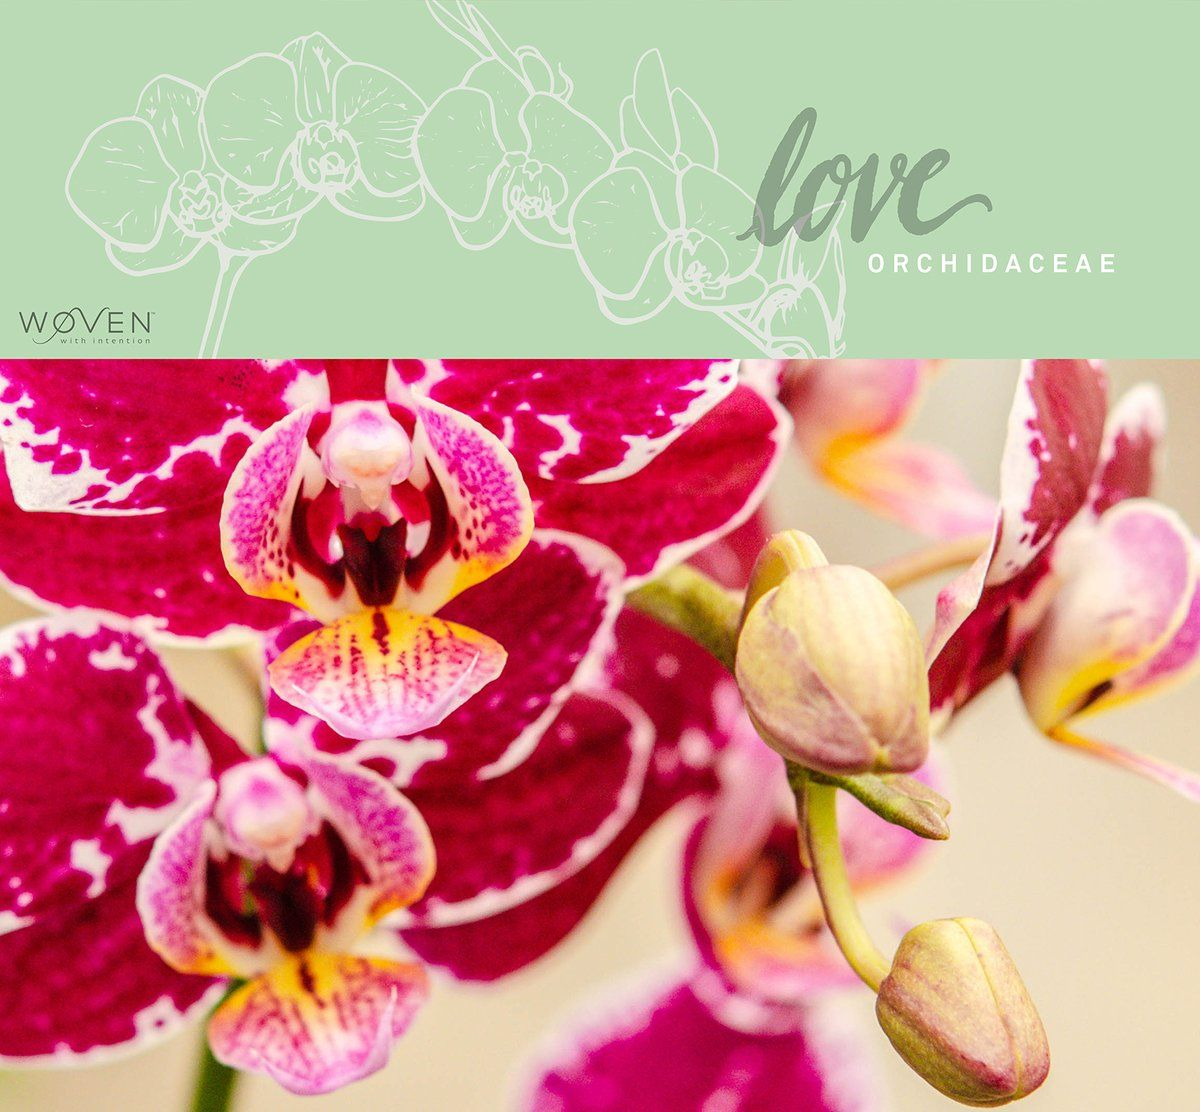 Love The Orchid Orchidaceae Orchids Orchidaceae Moth Orchid